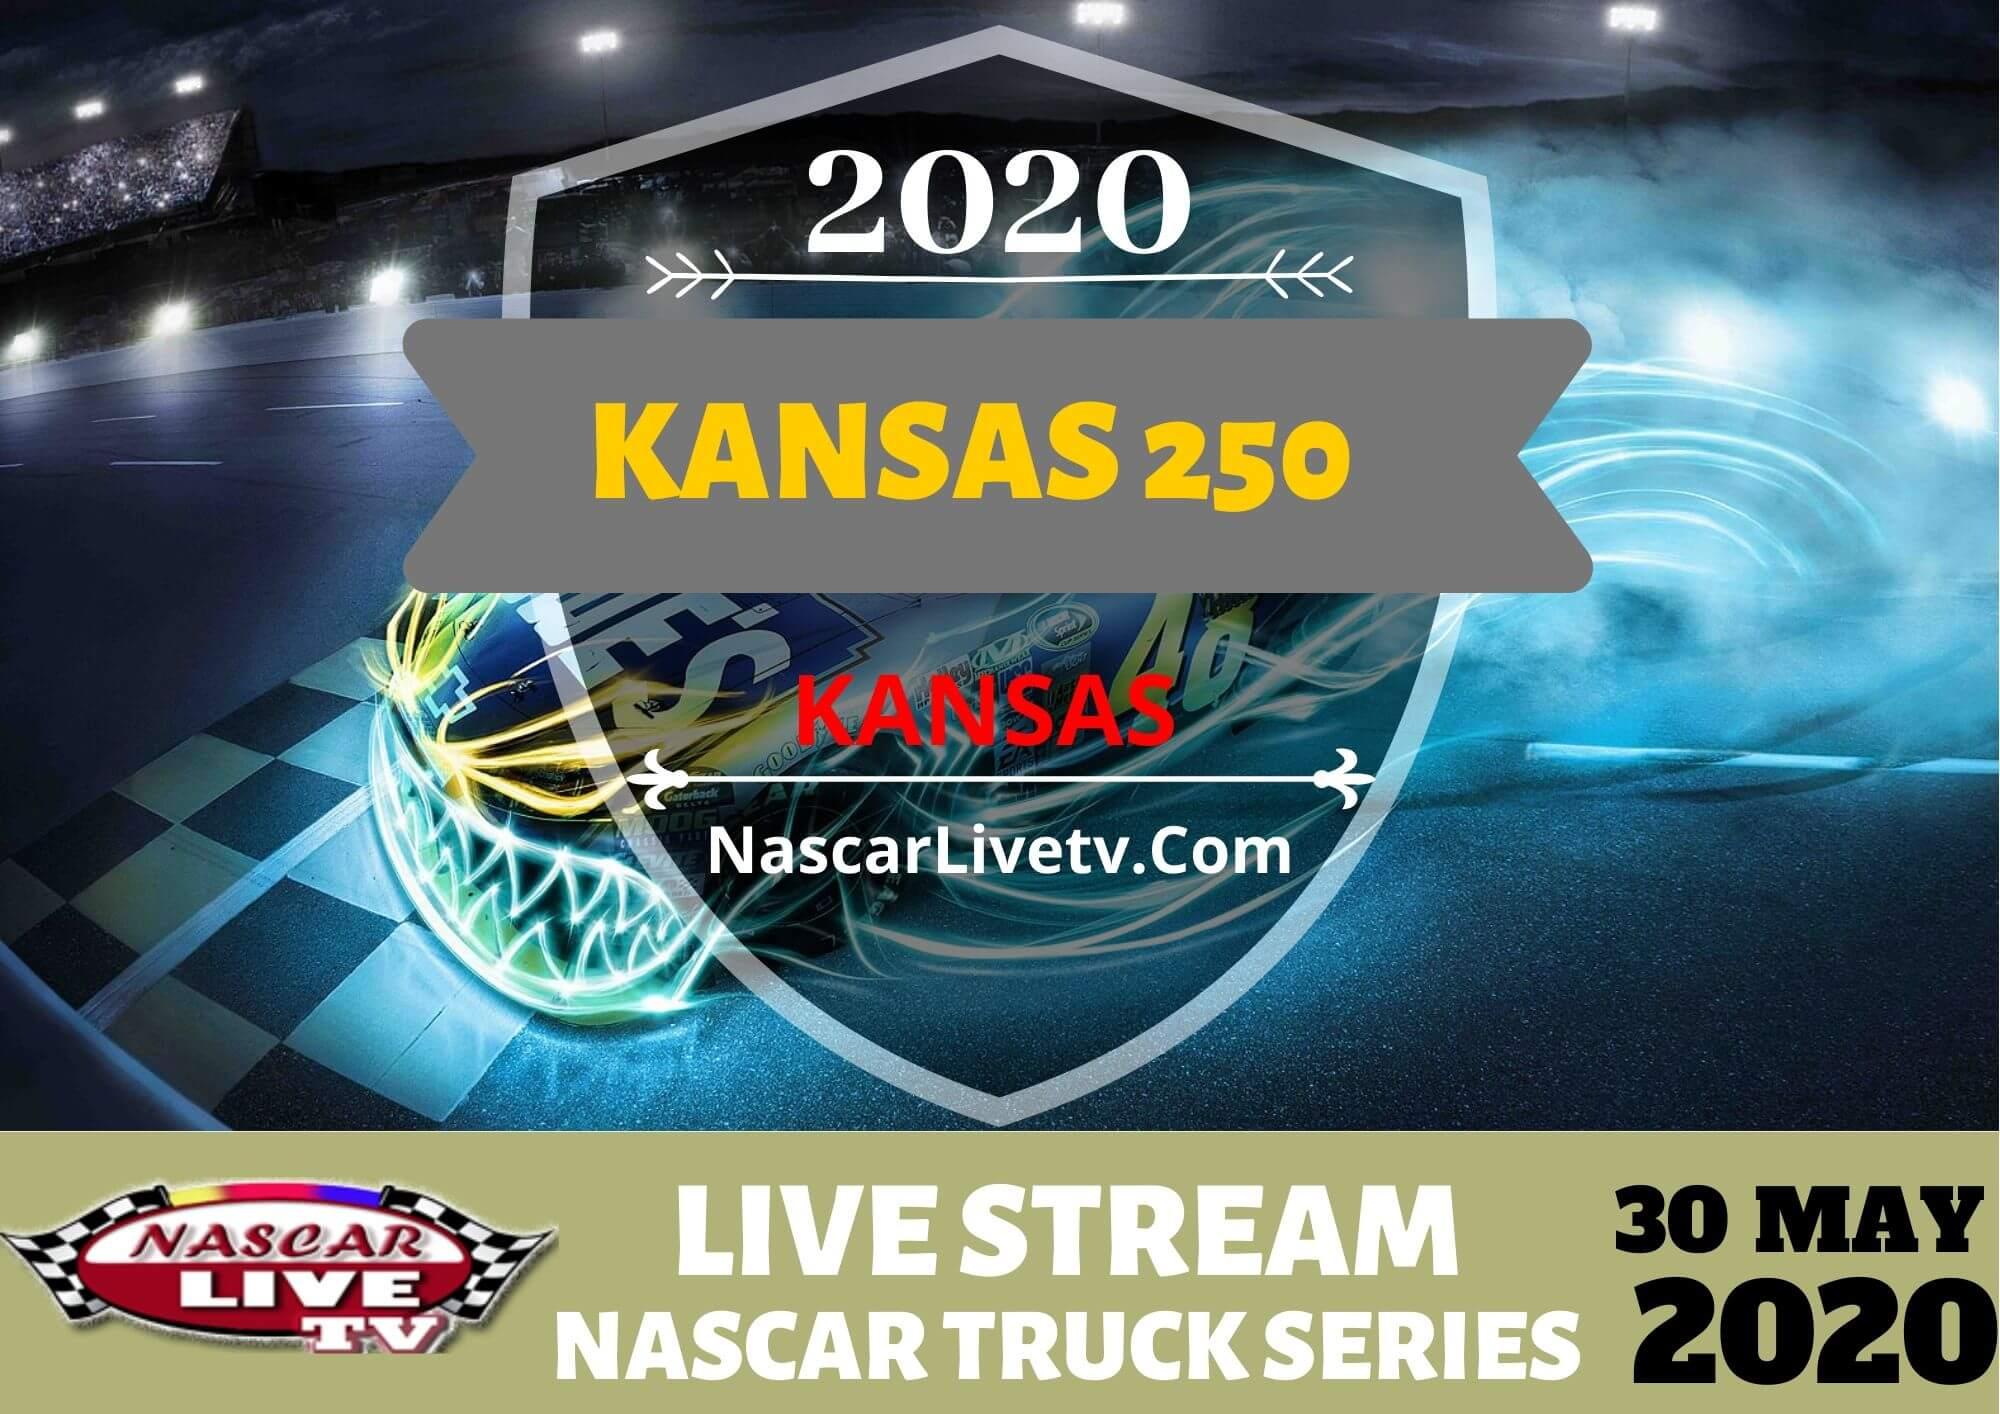 NGOTS Kansas 250 Live Stream 2020